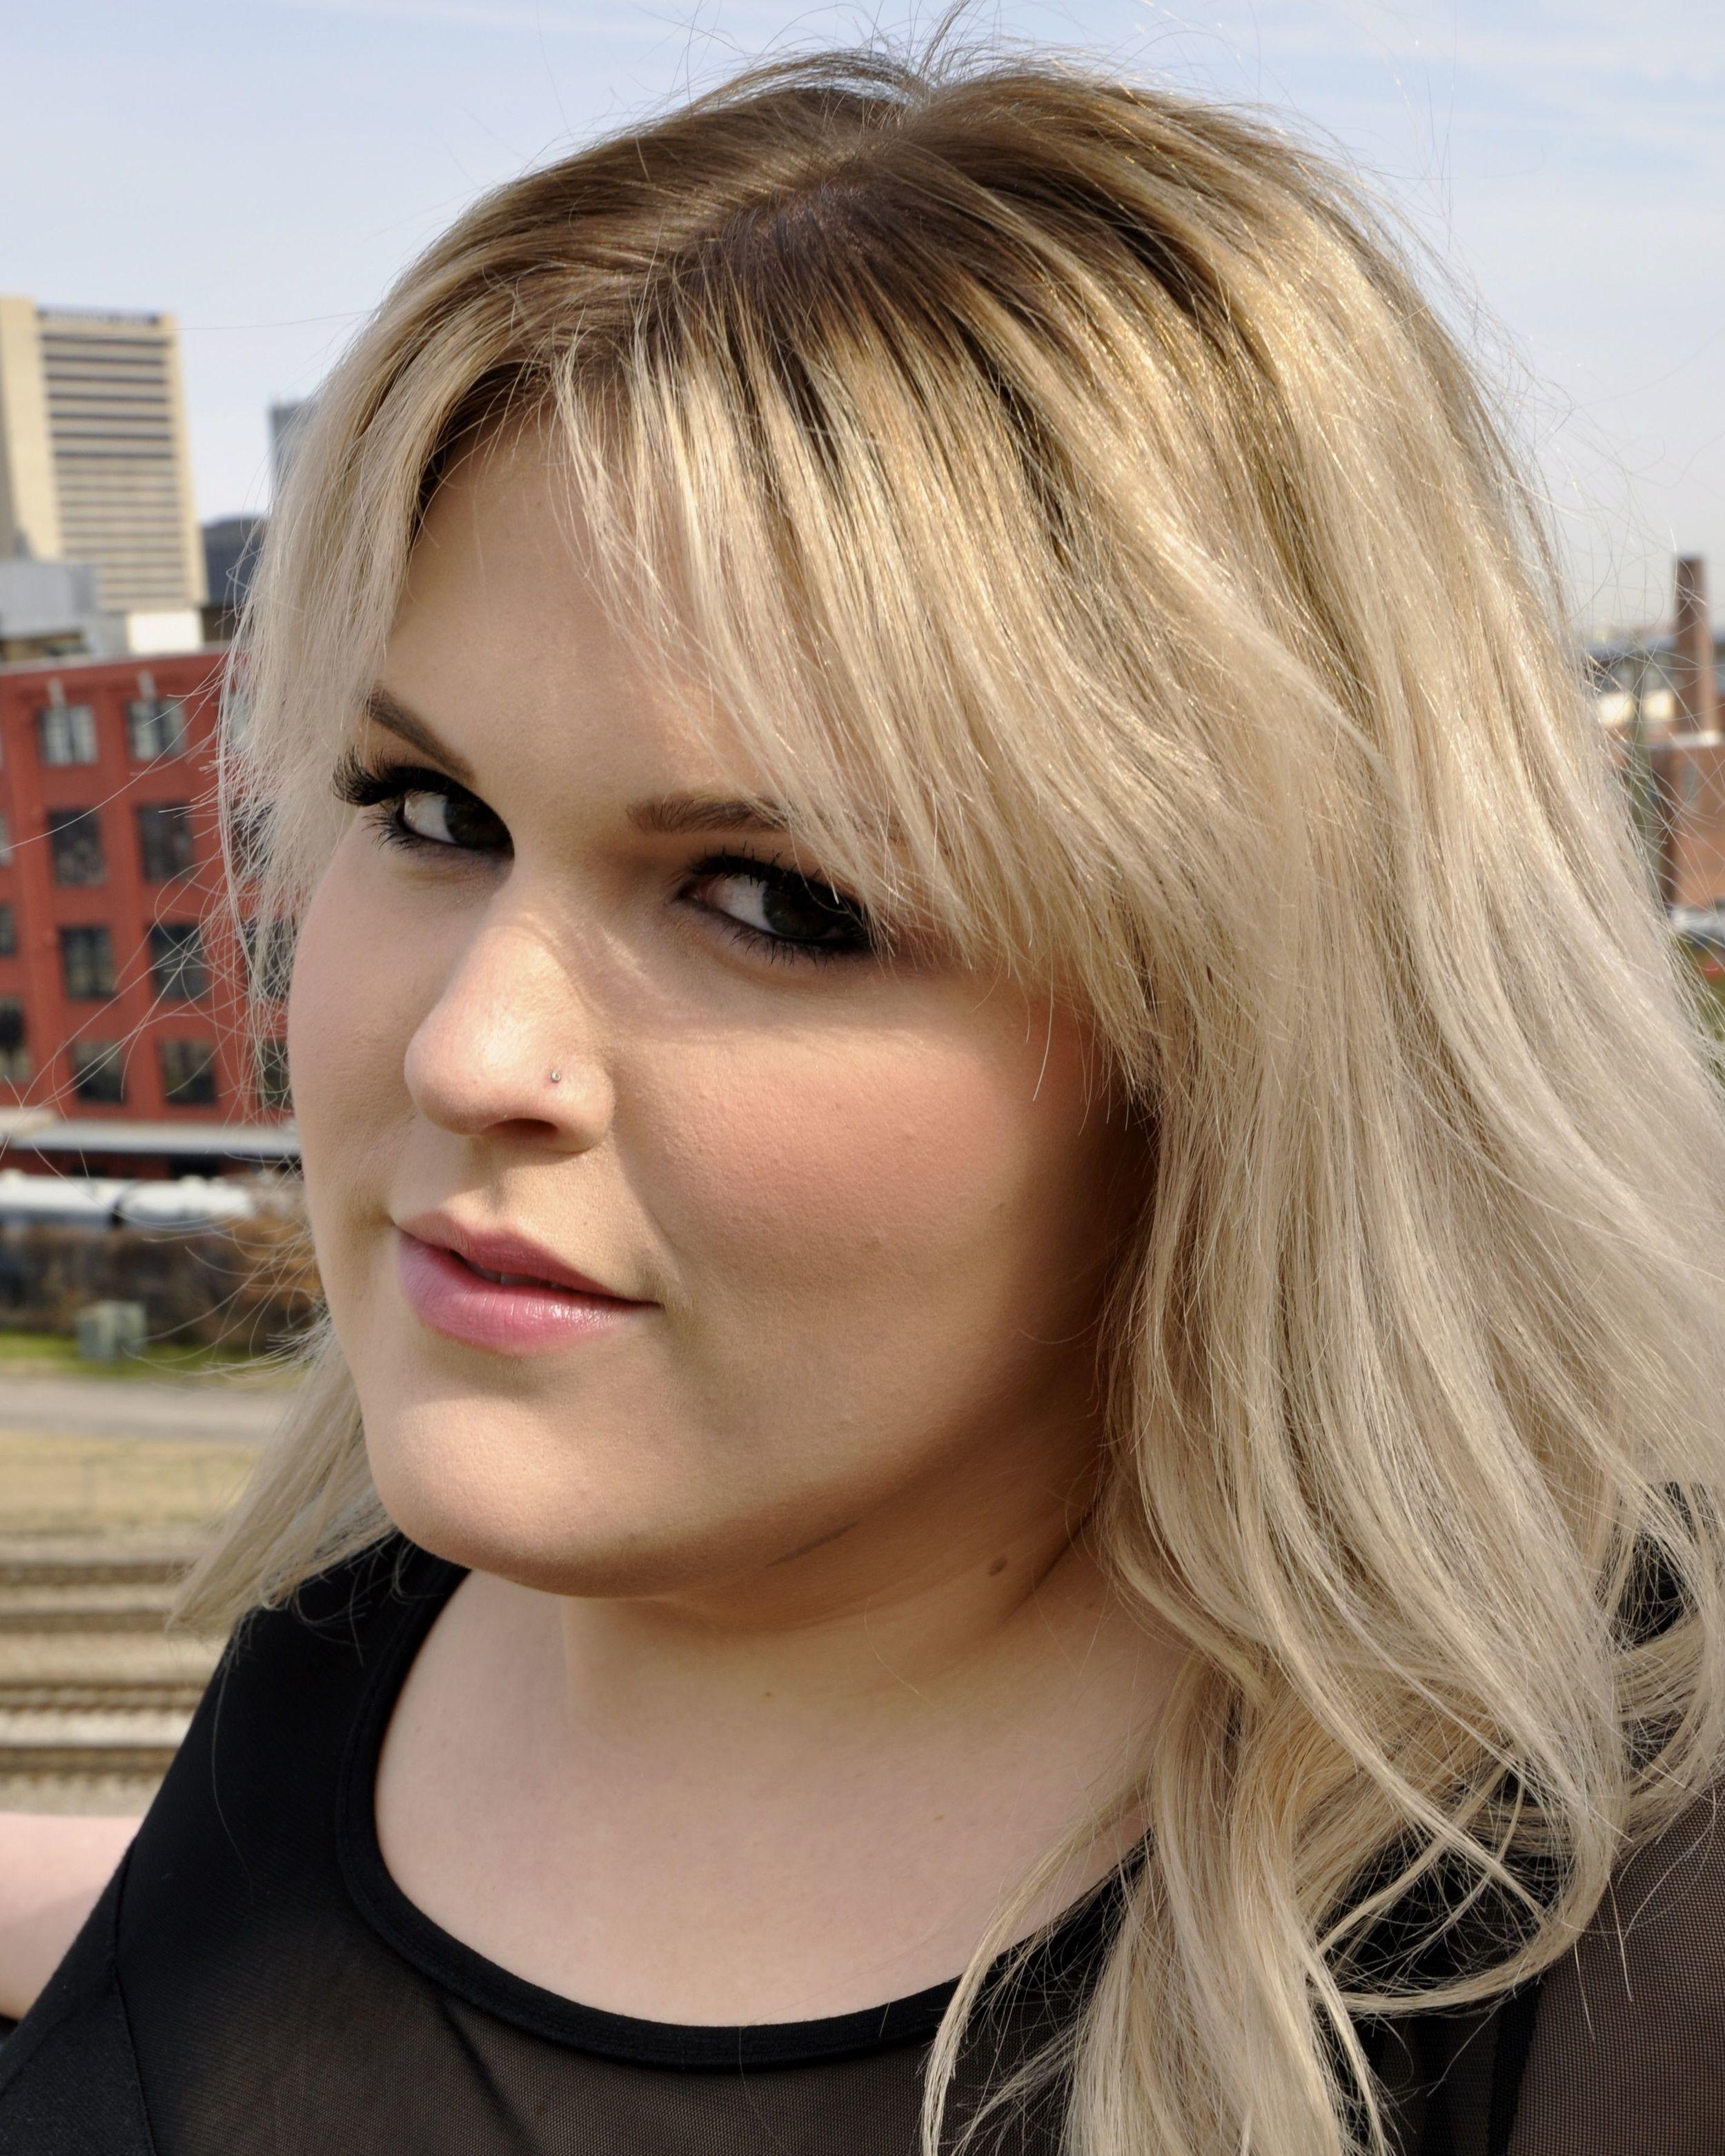 Model: Sarah Beth Sullivan